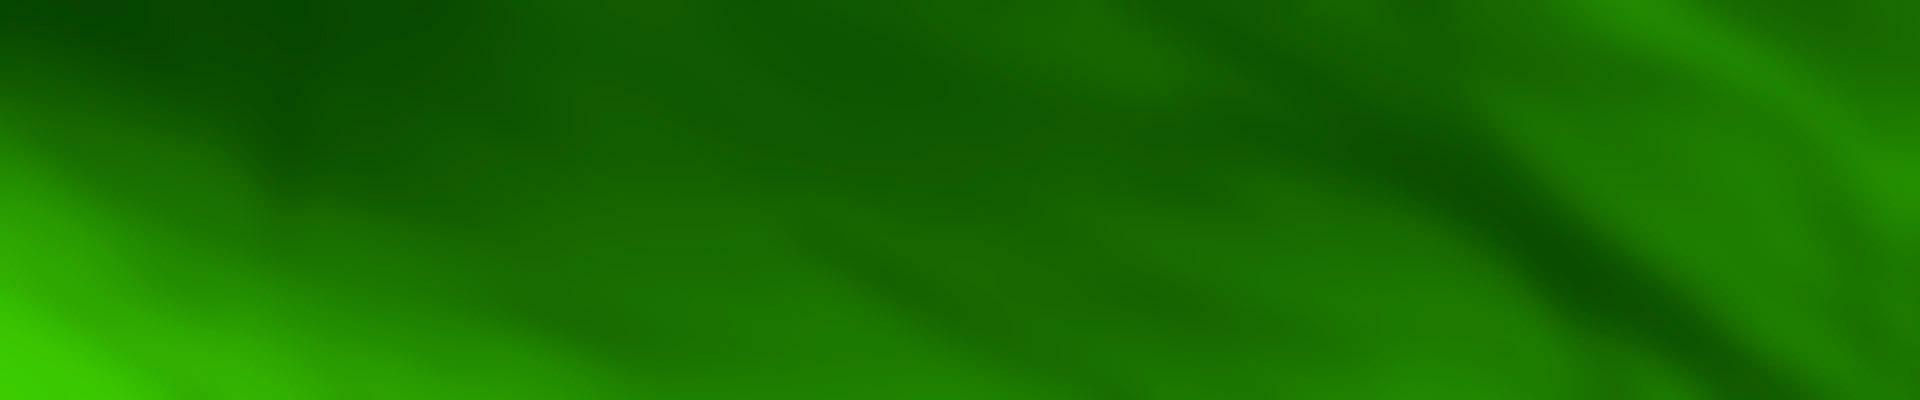 GreenPage-2